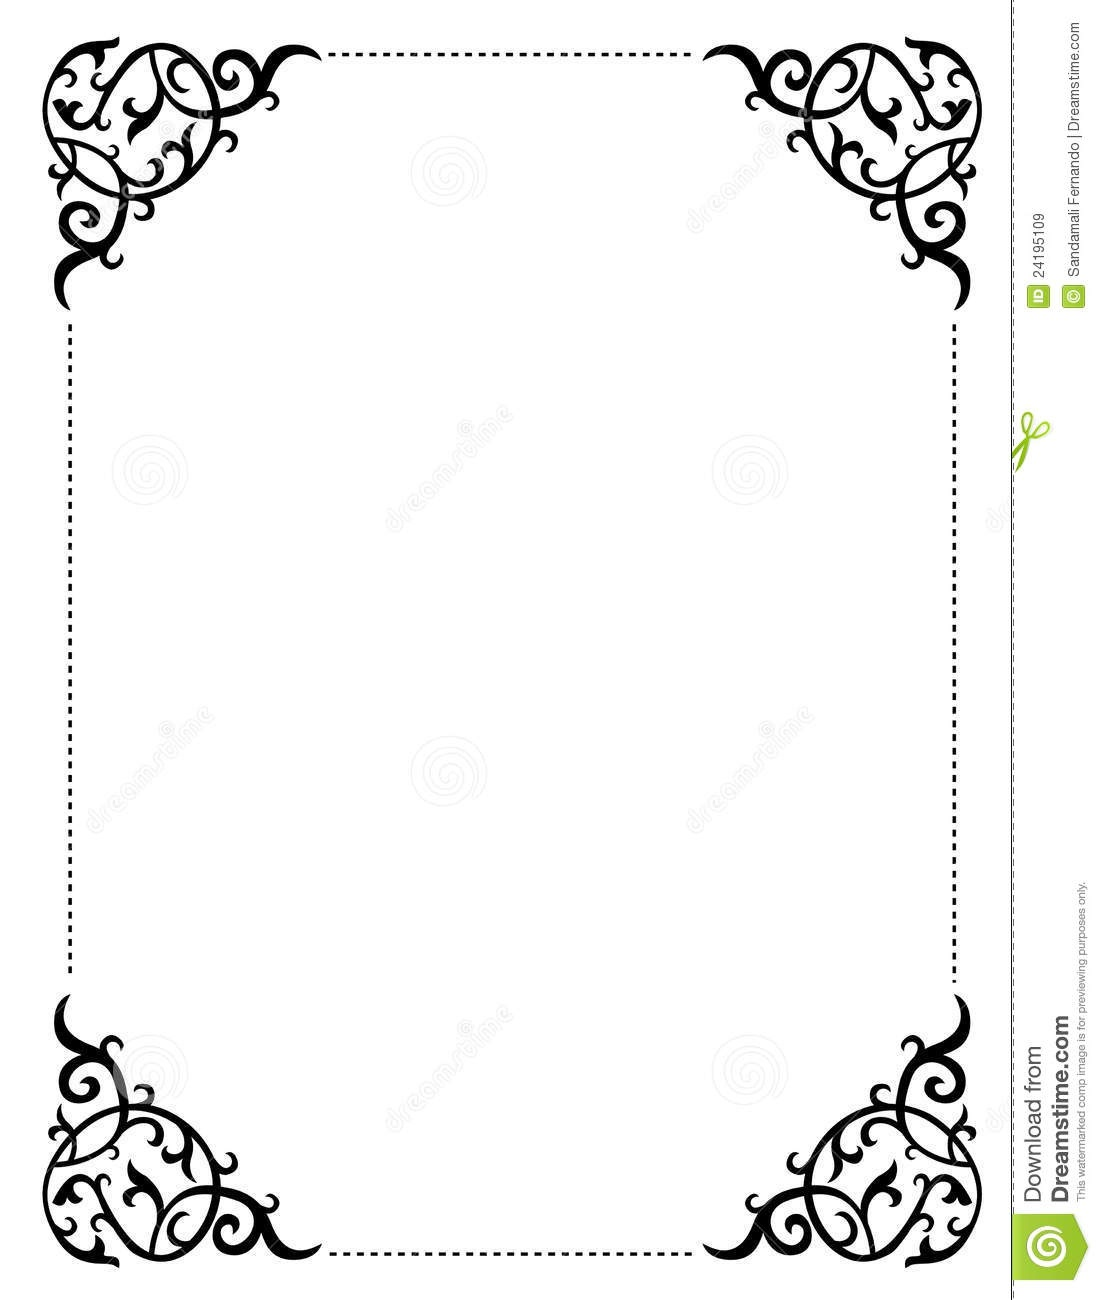 Wedding Scrolls Clipart   Free Download Best Wedding Scrolls Clipart - Free Printable Wedding Scrolls